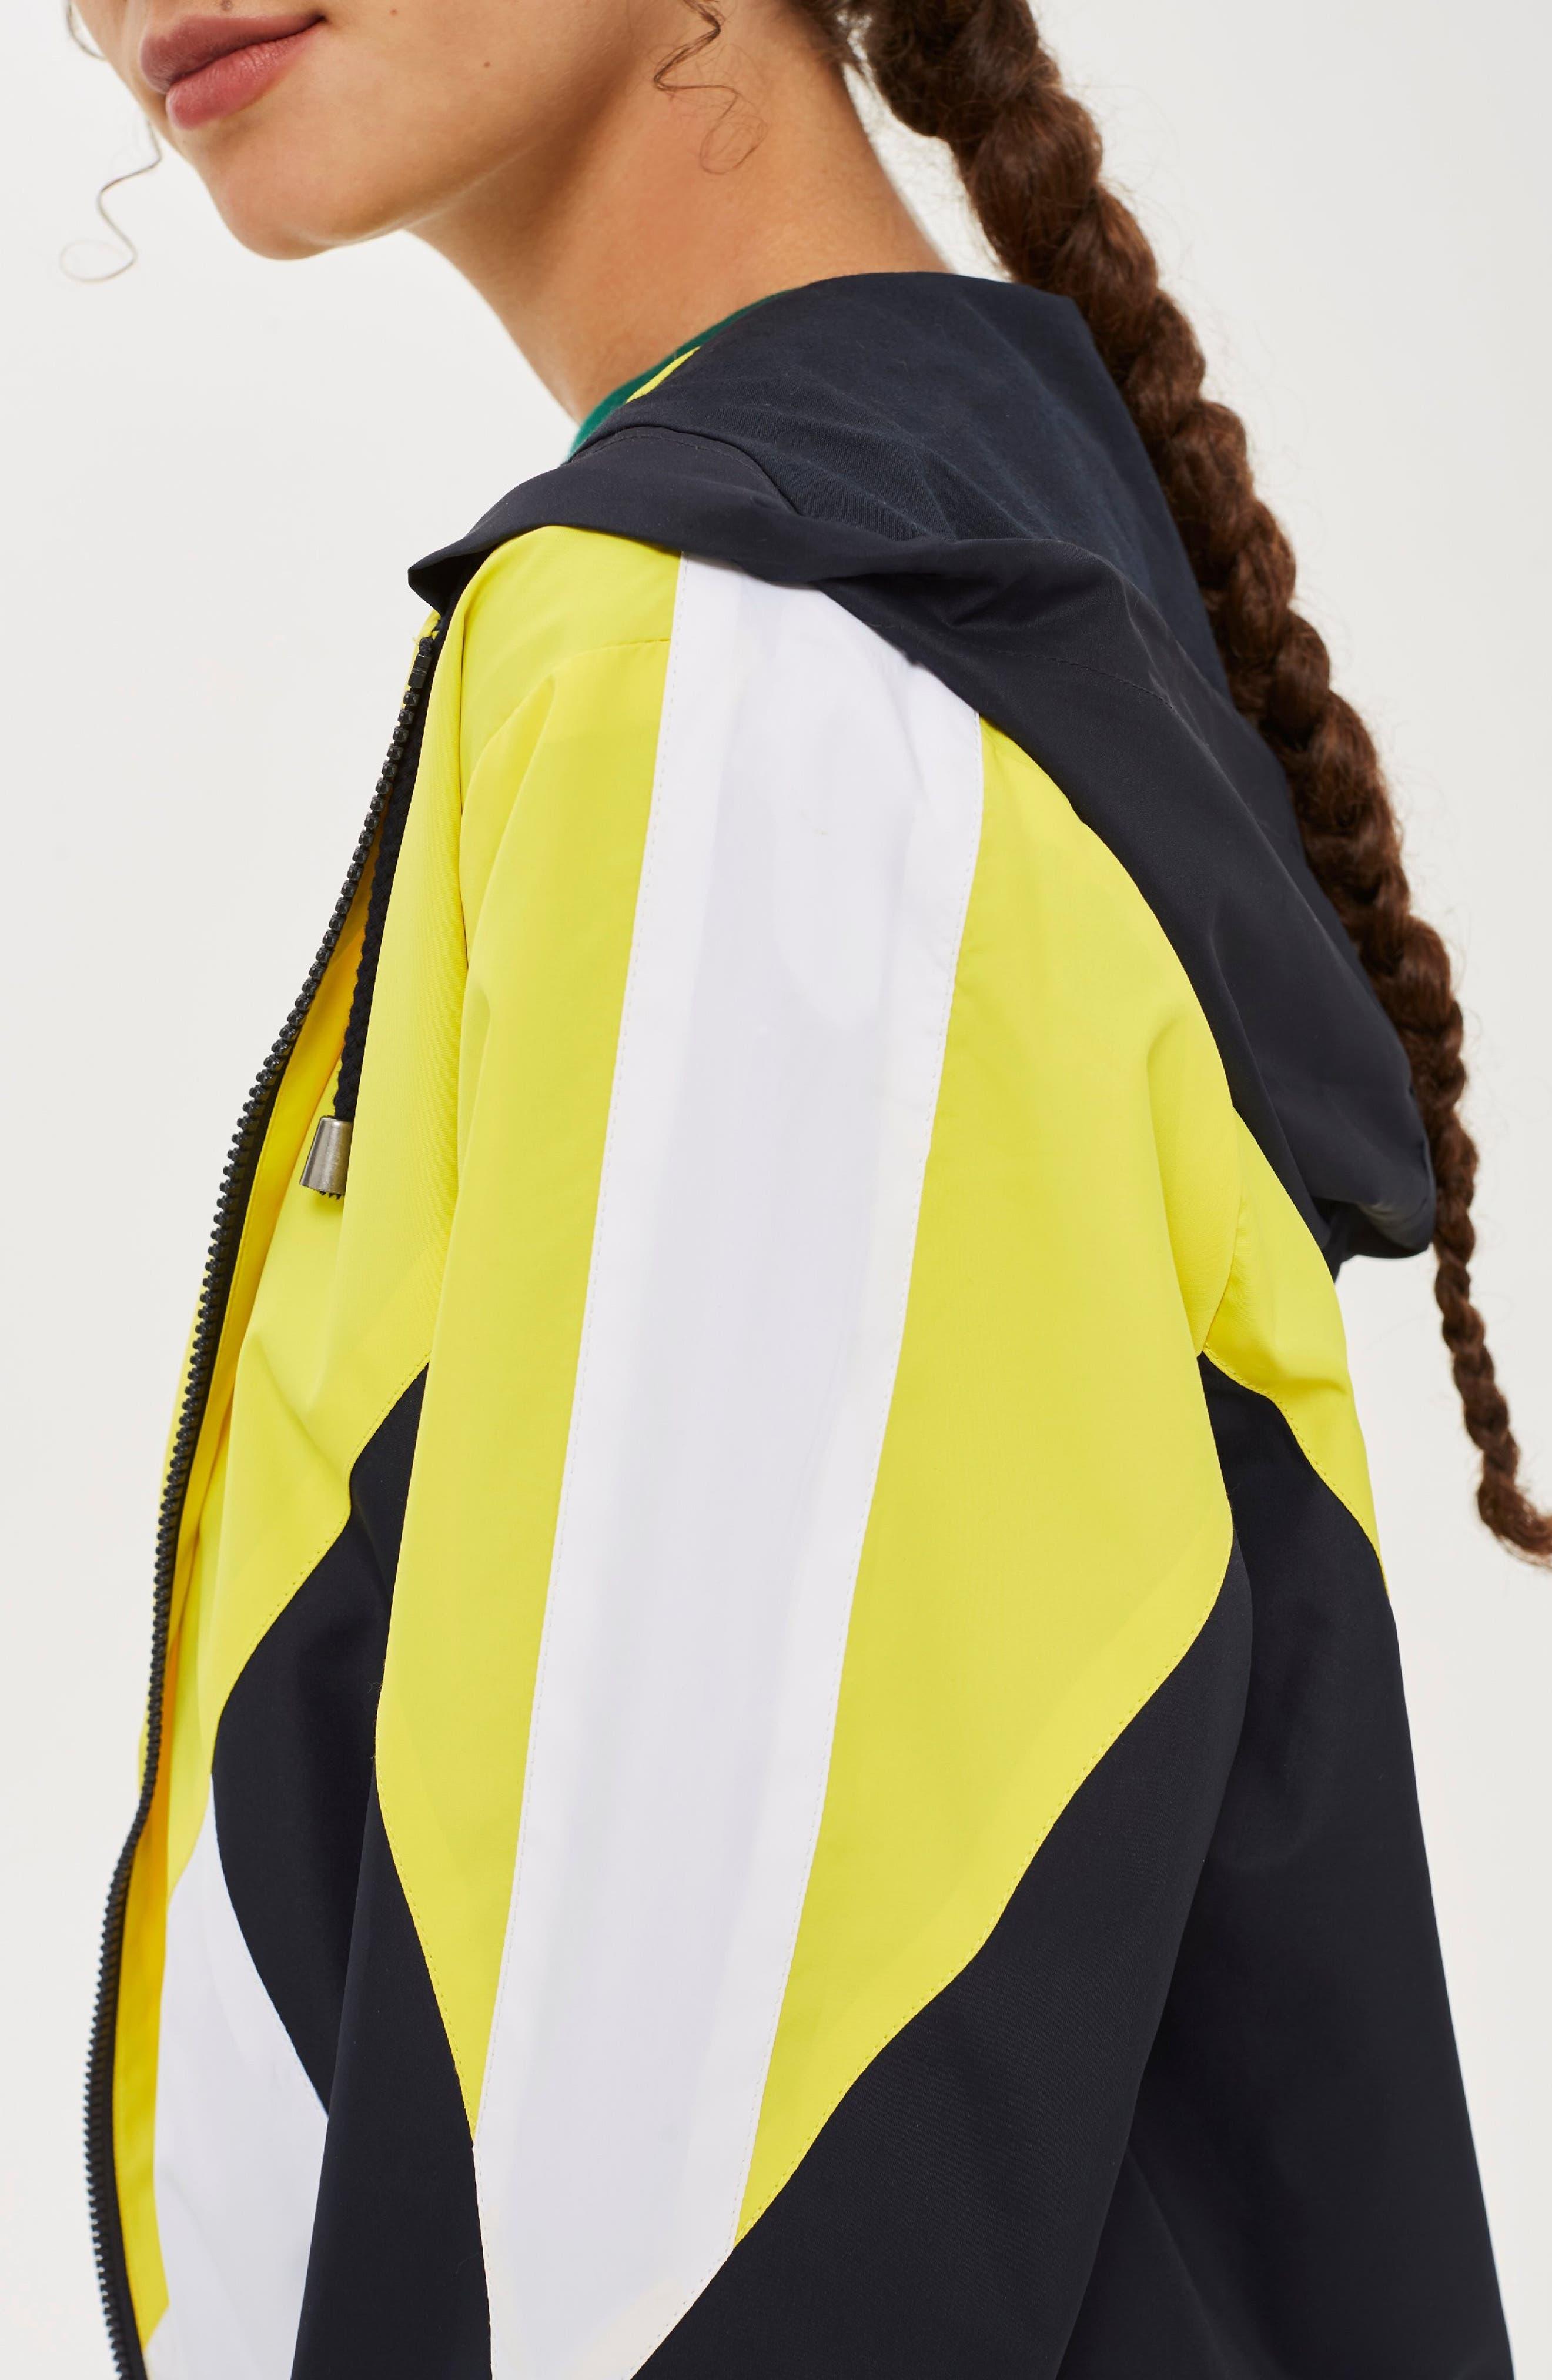 Texas Colorblock Windbreaker Jacket,                             Alternate thumbnail 7, color,                             YELLOW MULTI